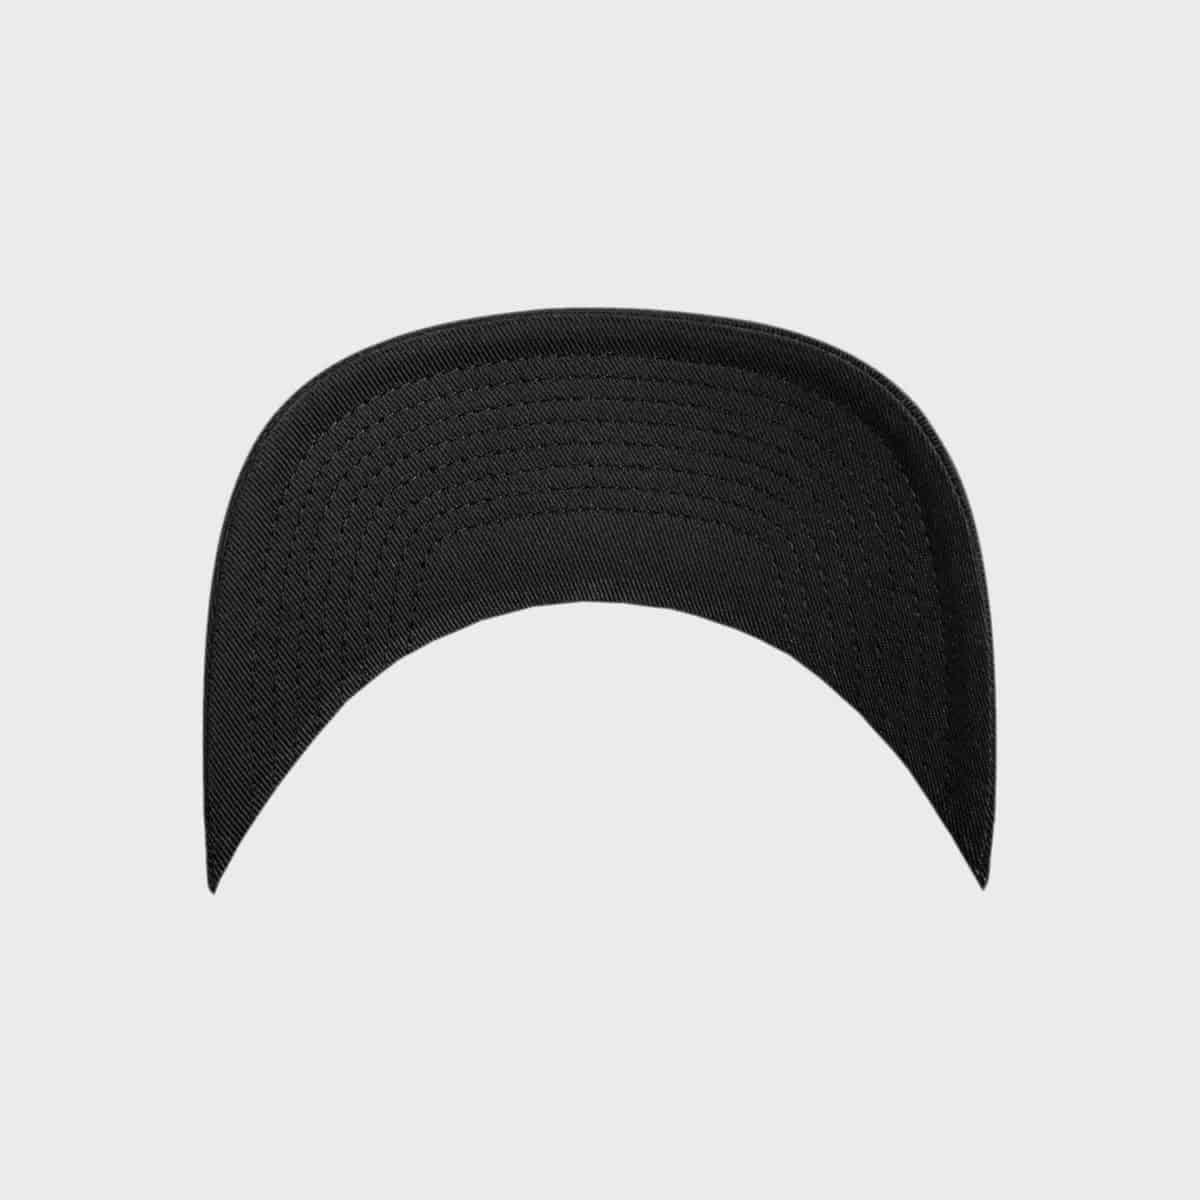 Flexfit MarkenCaps FFE 6588 Black Schirm